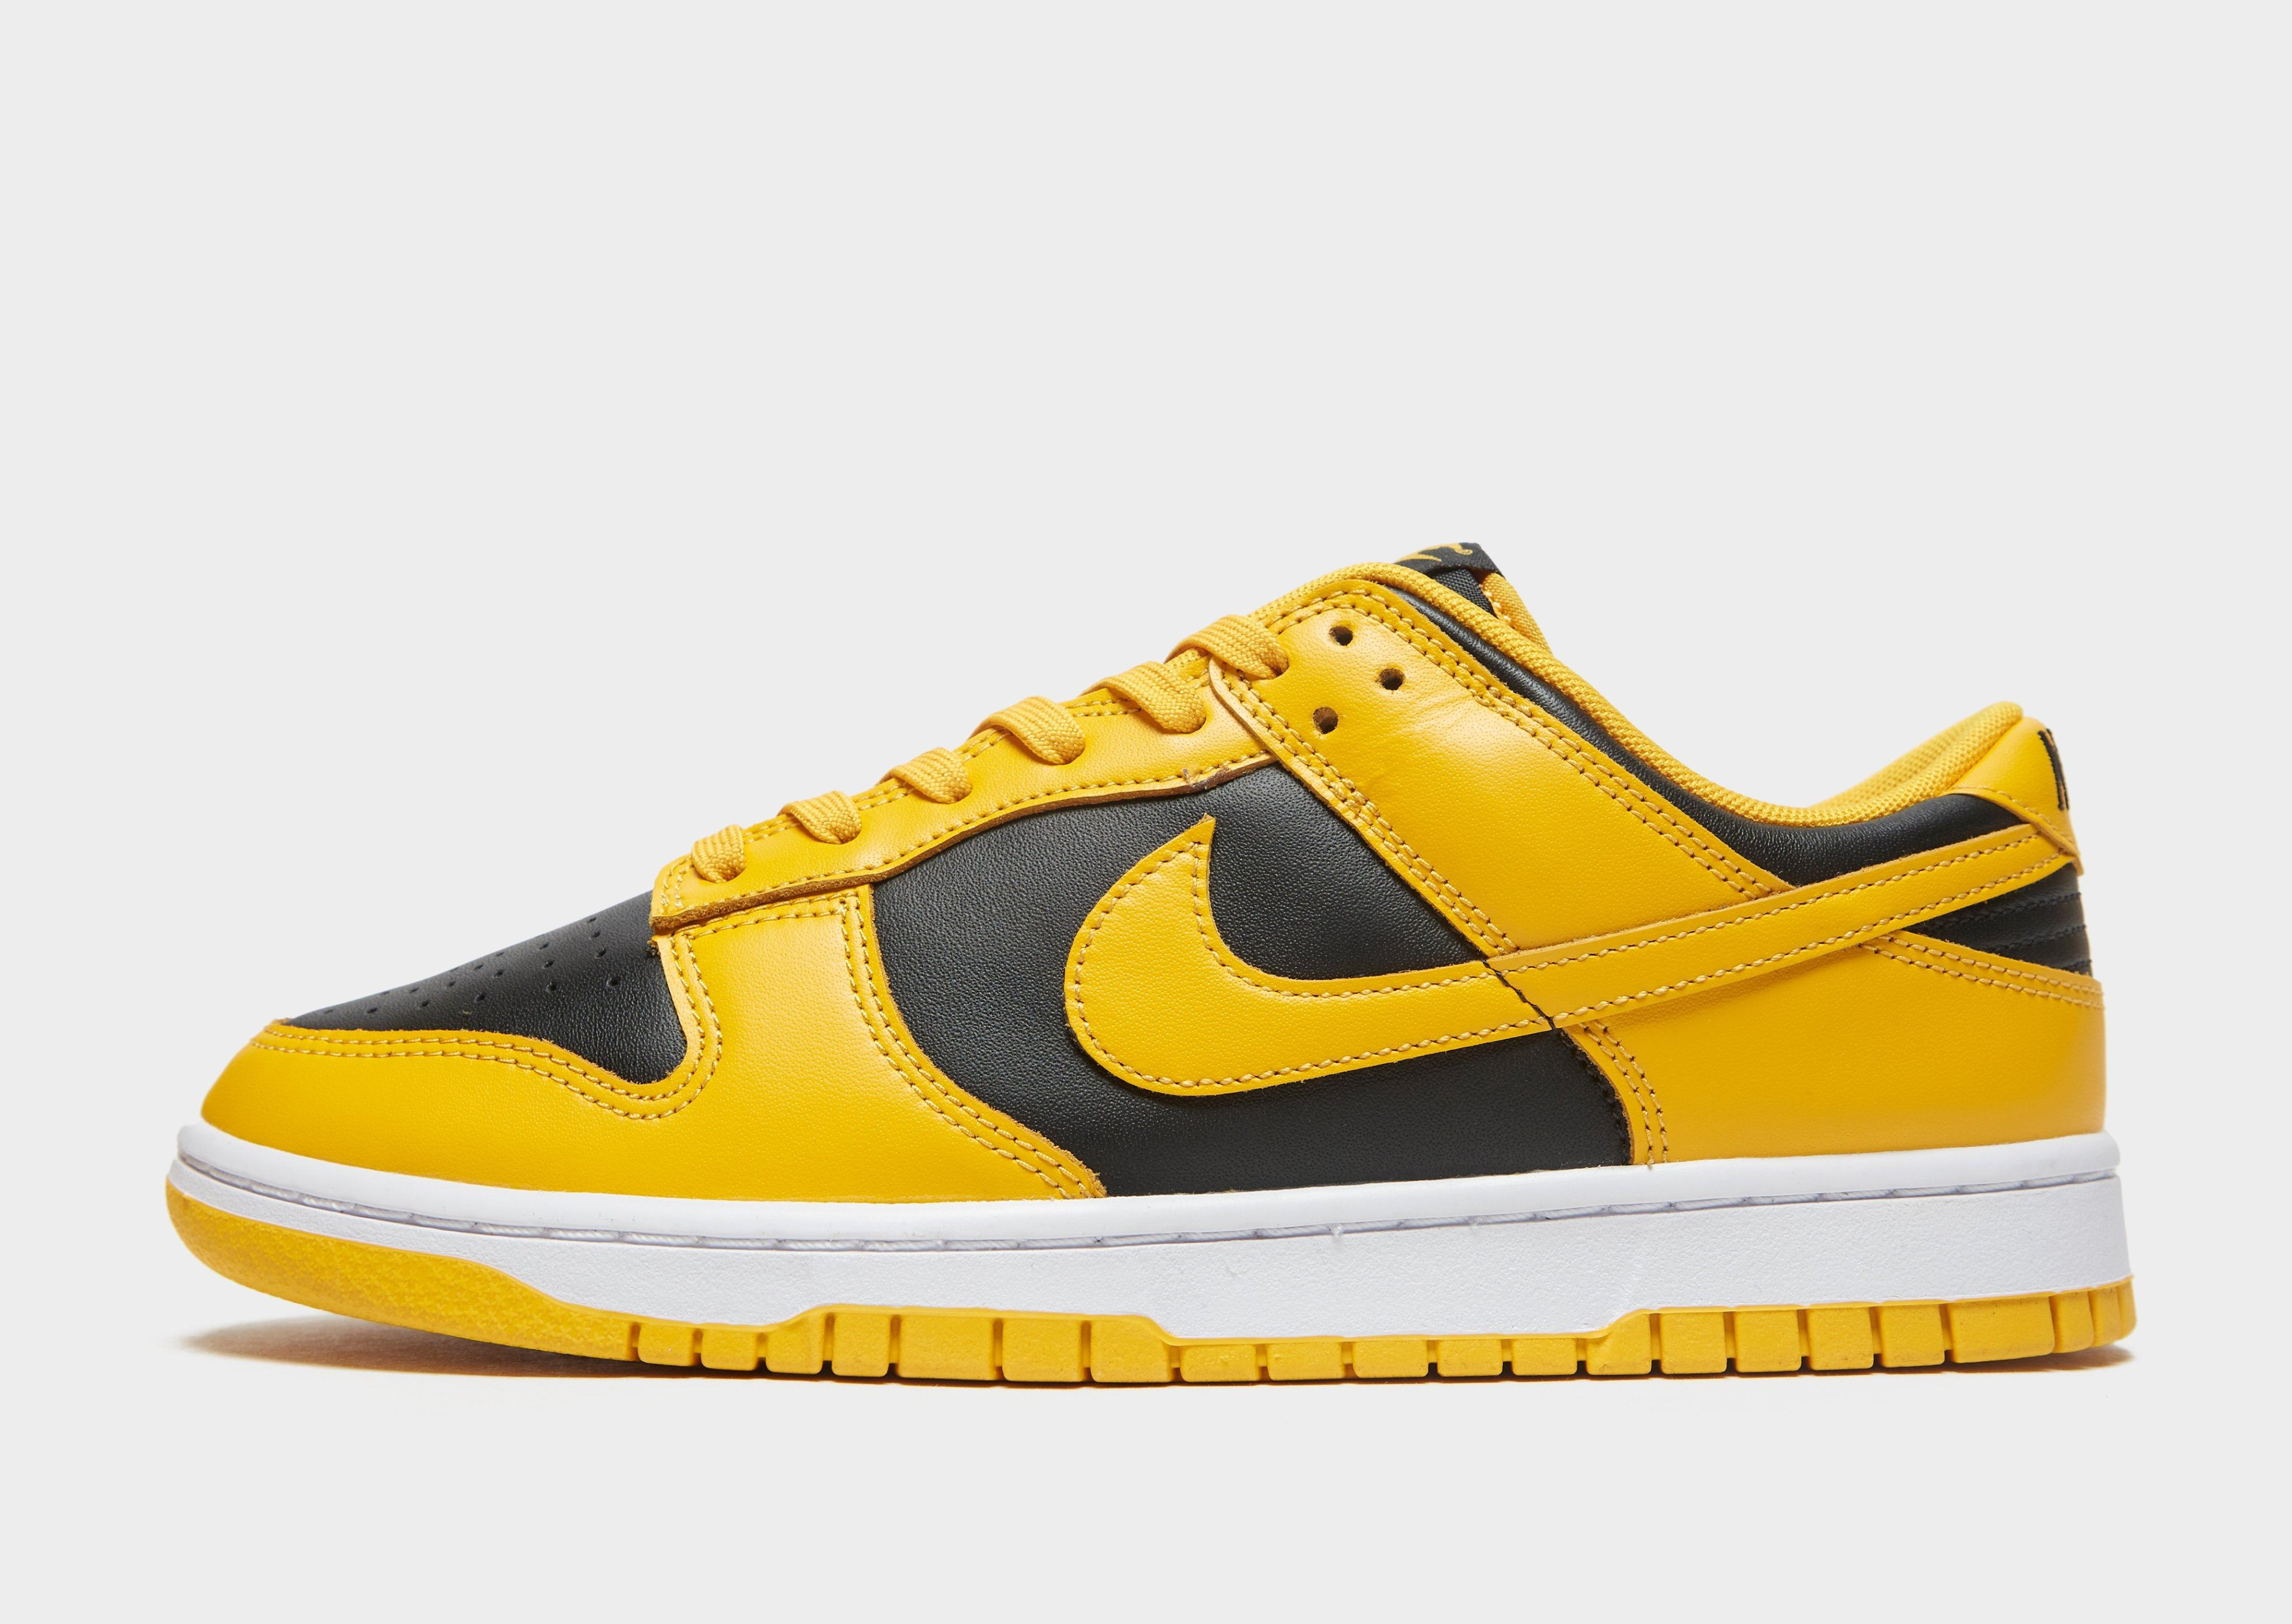 Nike Dunk Low 'Goldenrod